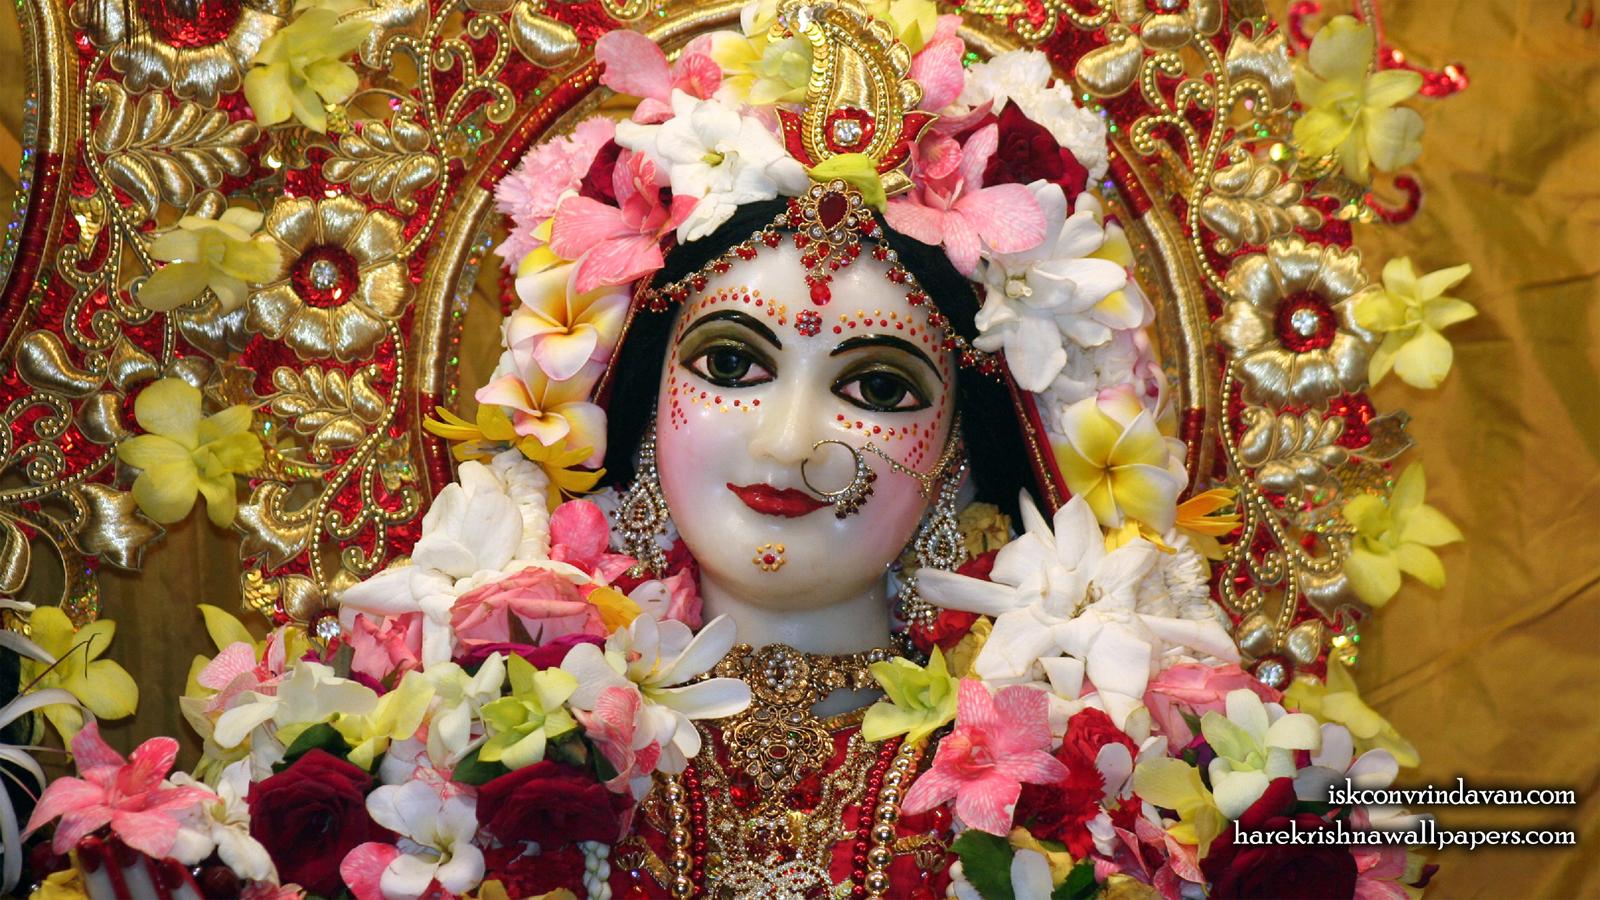 Sri Radha Close up Wallpaper (008) Size 1600x900 Download